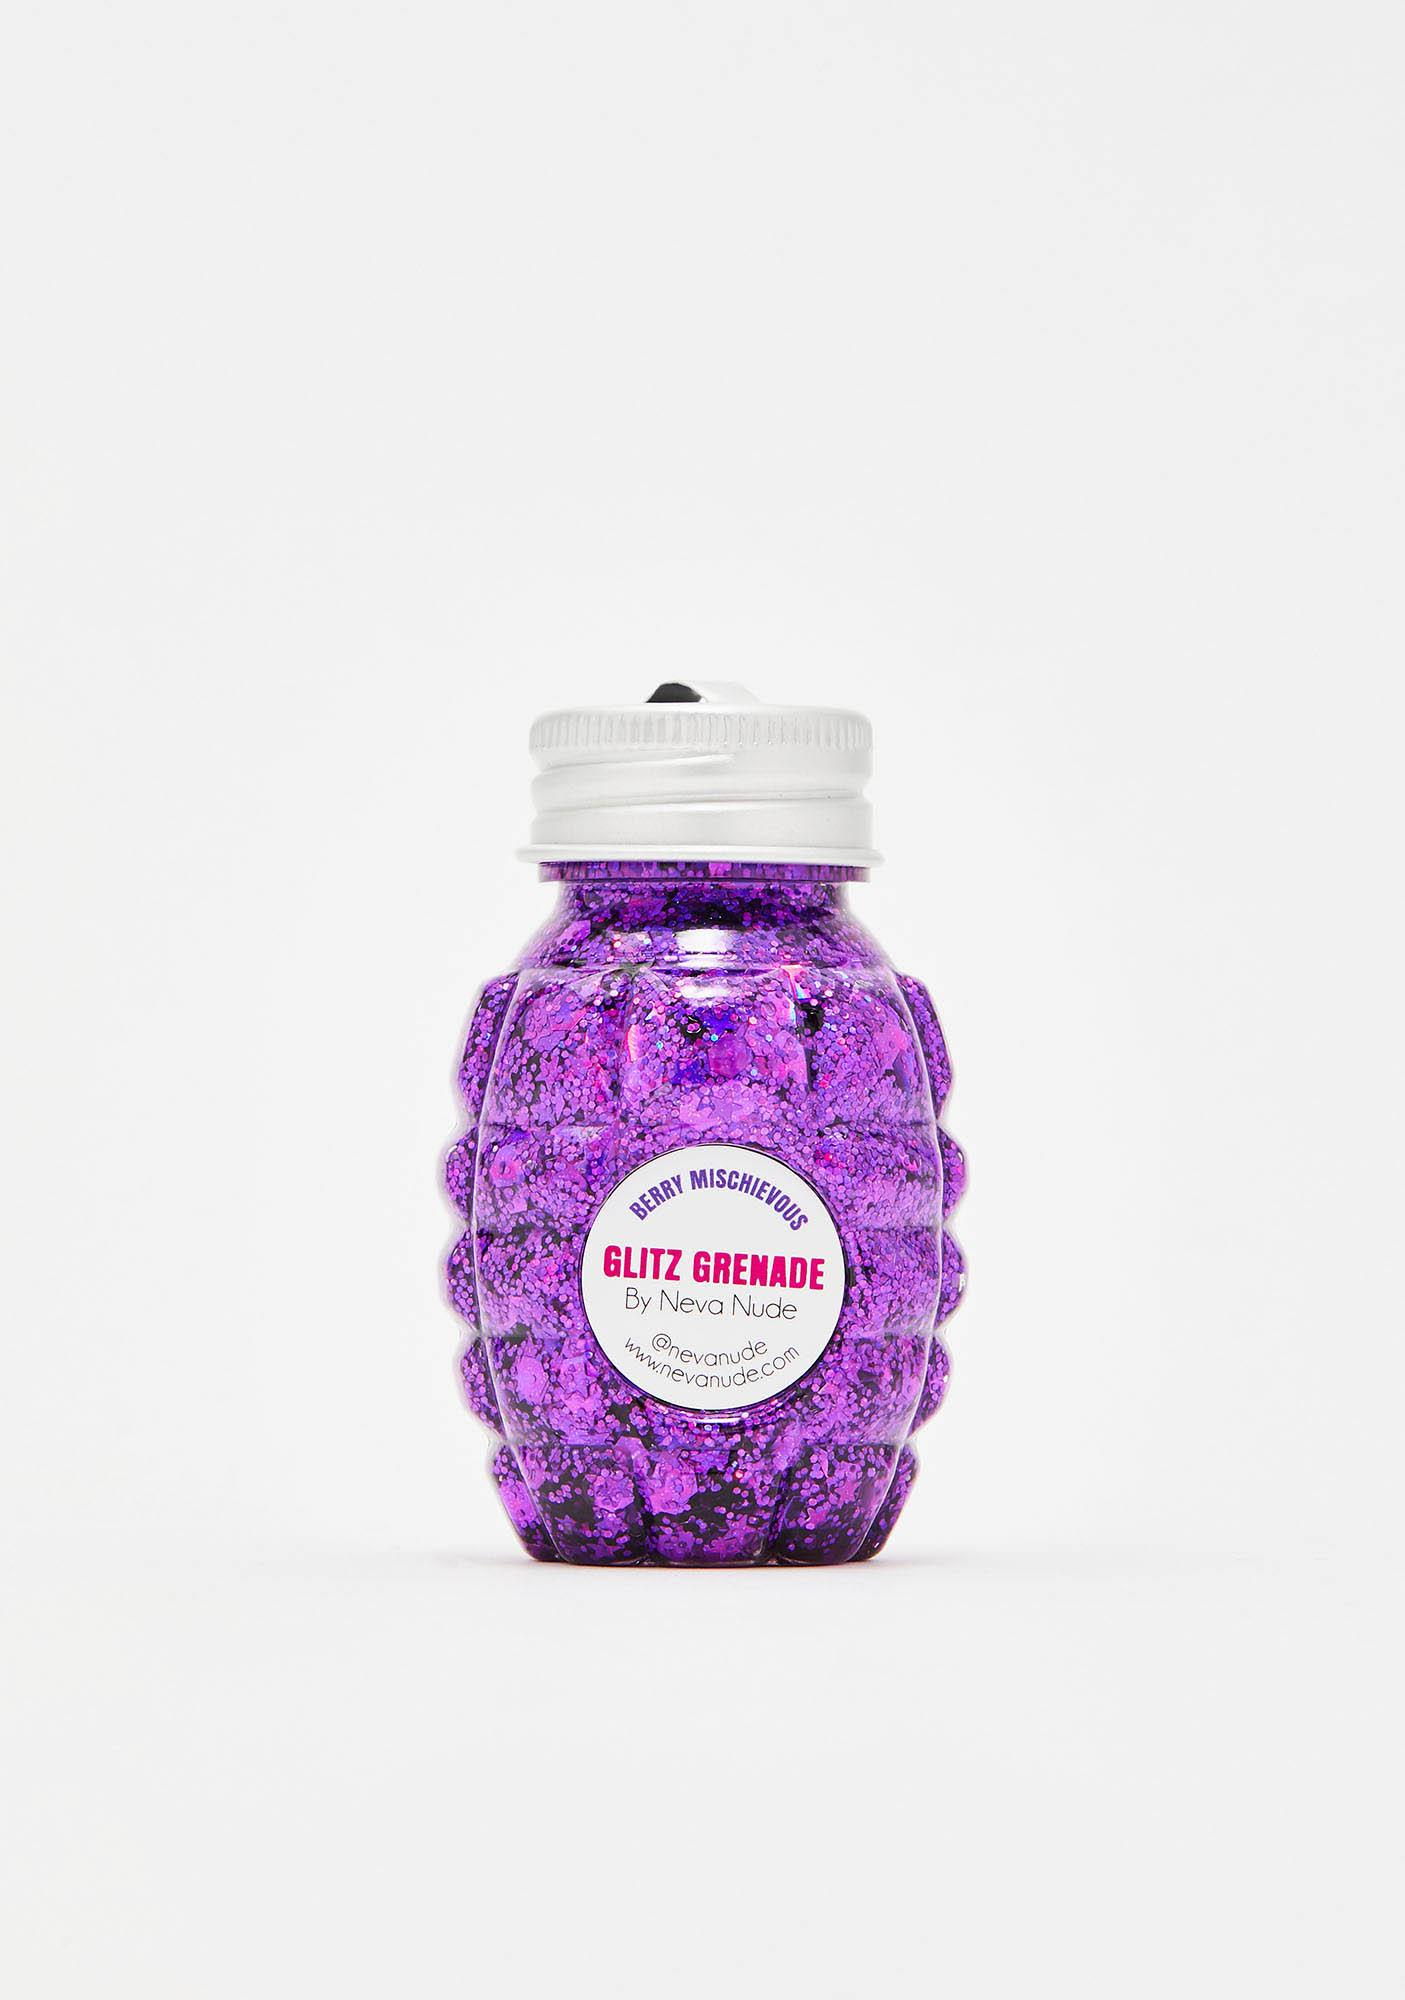 Neva Nude Berry Mischievous Glitz Grenade Glitter